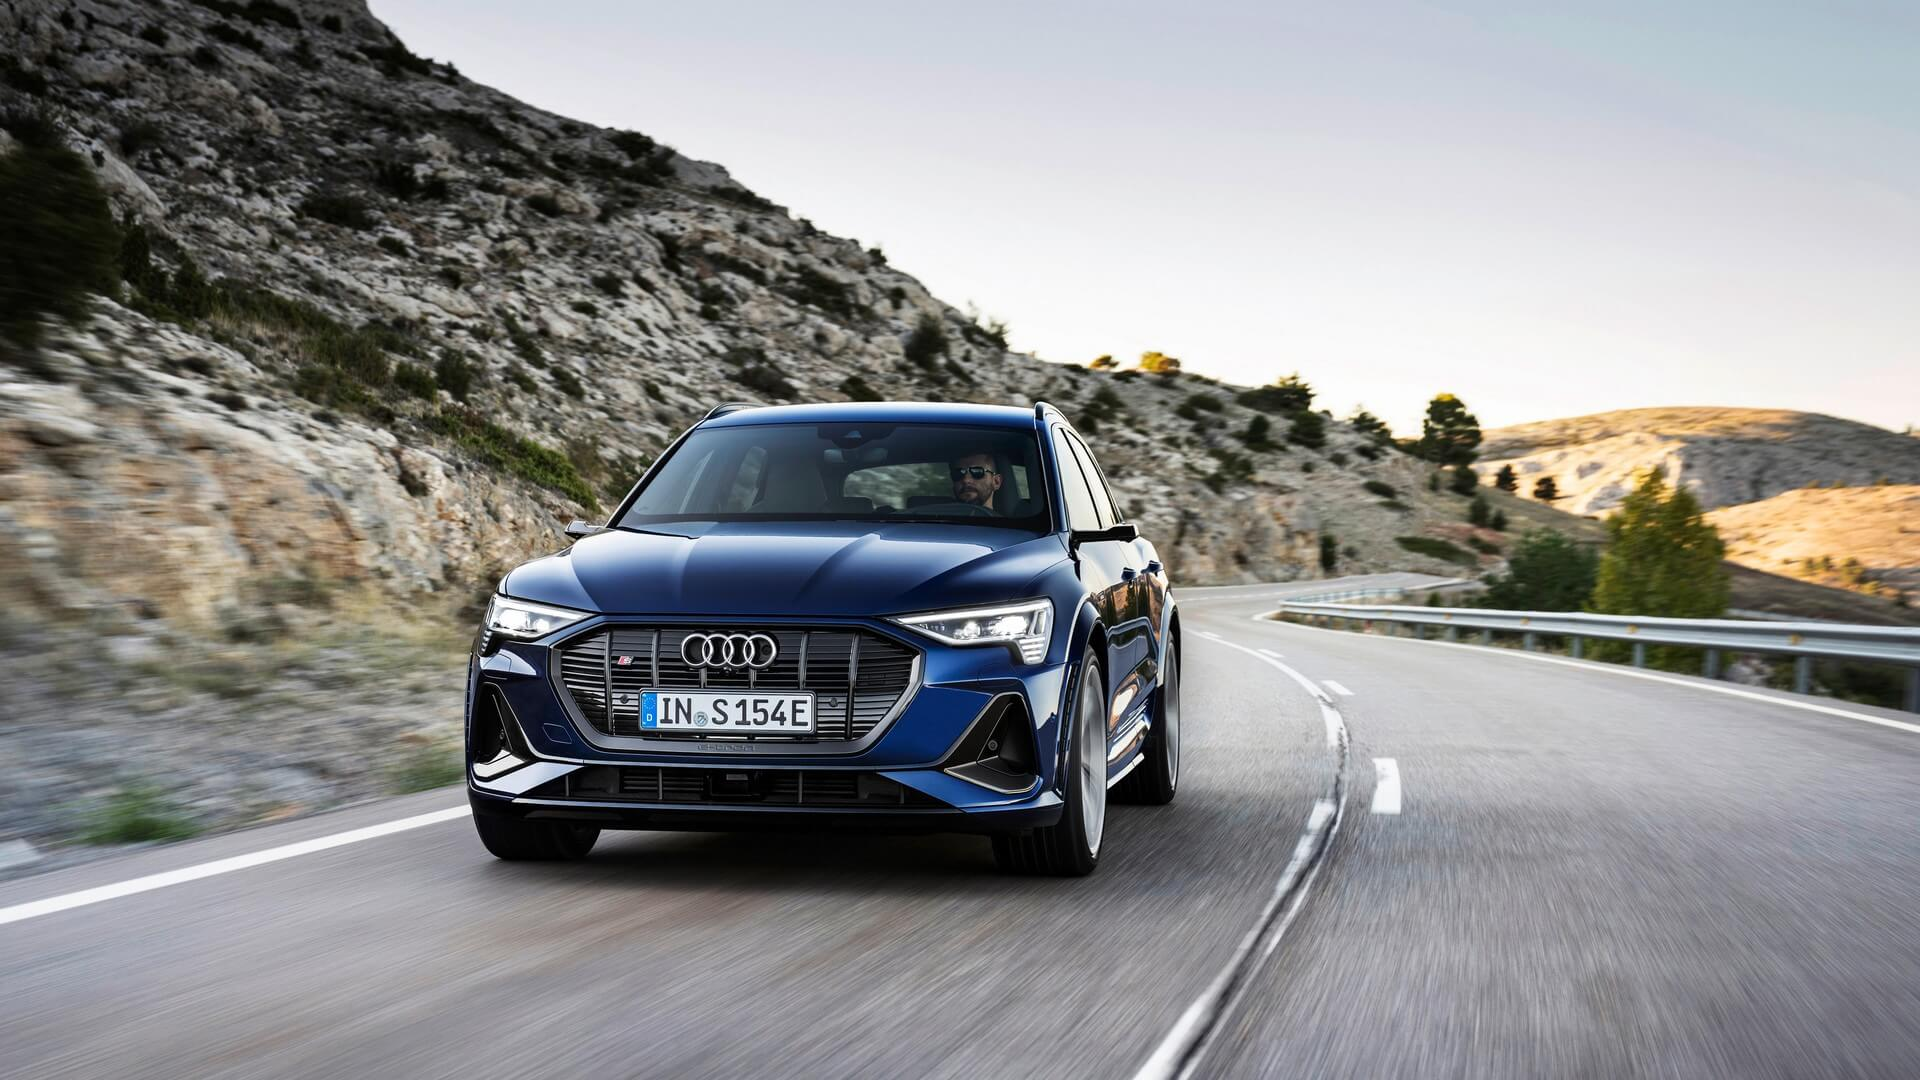 Audi-E-Tron-S-and-E-Tron-S-Sportback-2020-15